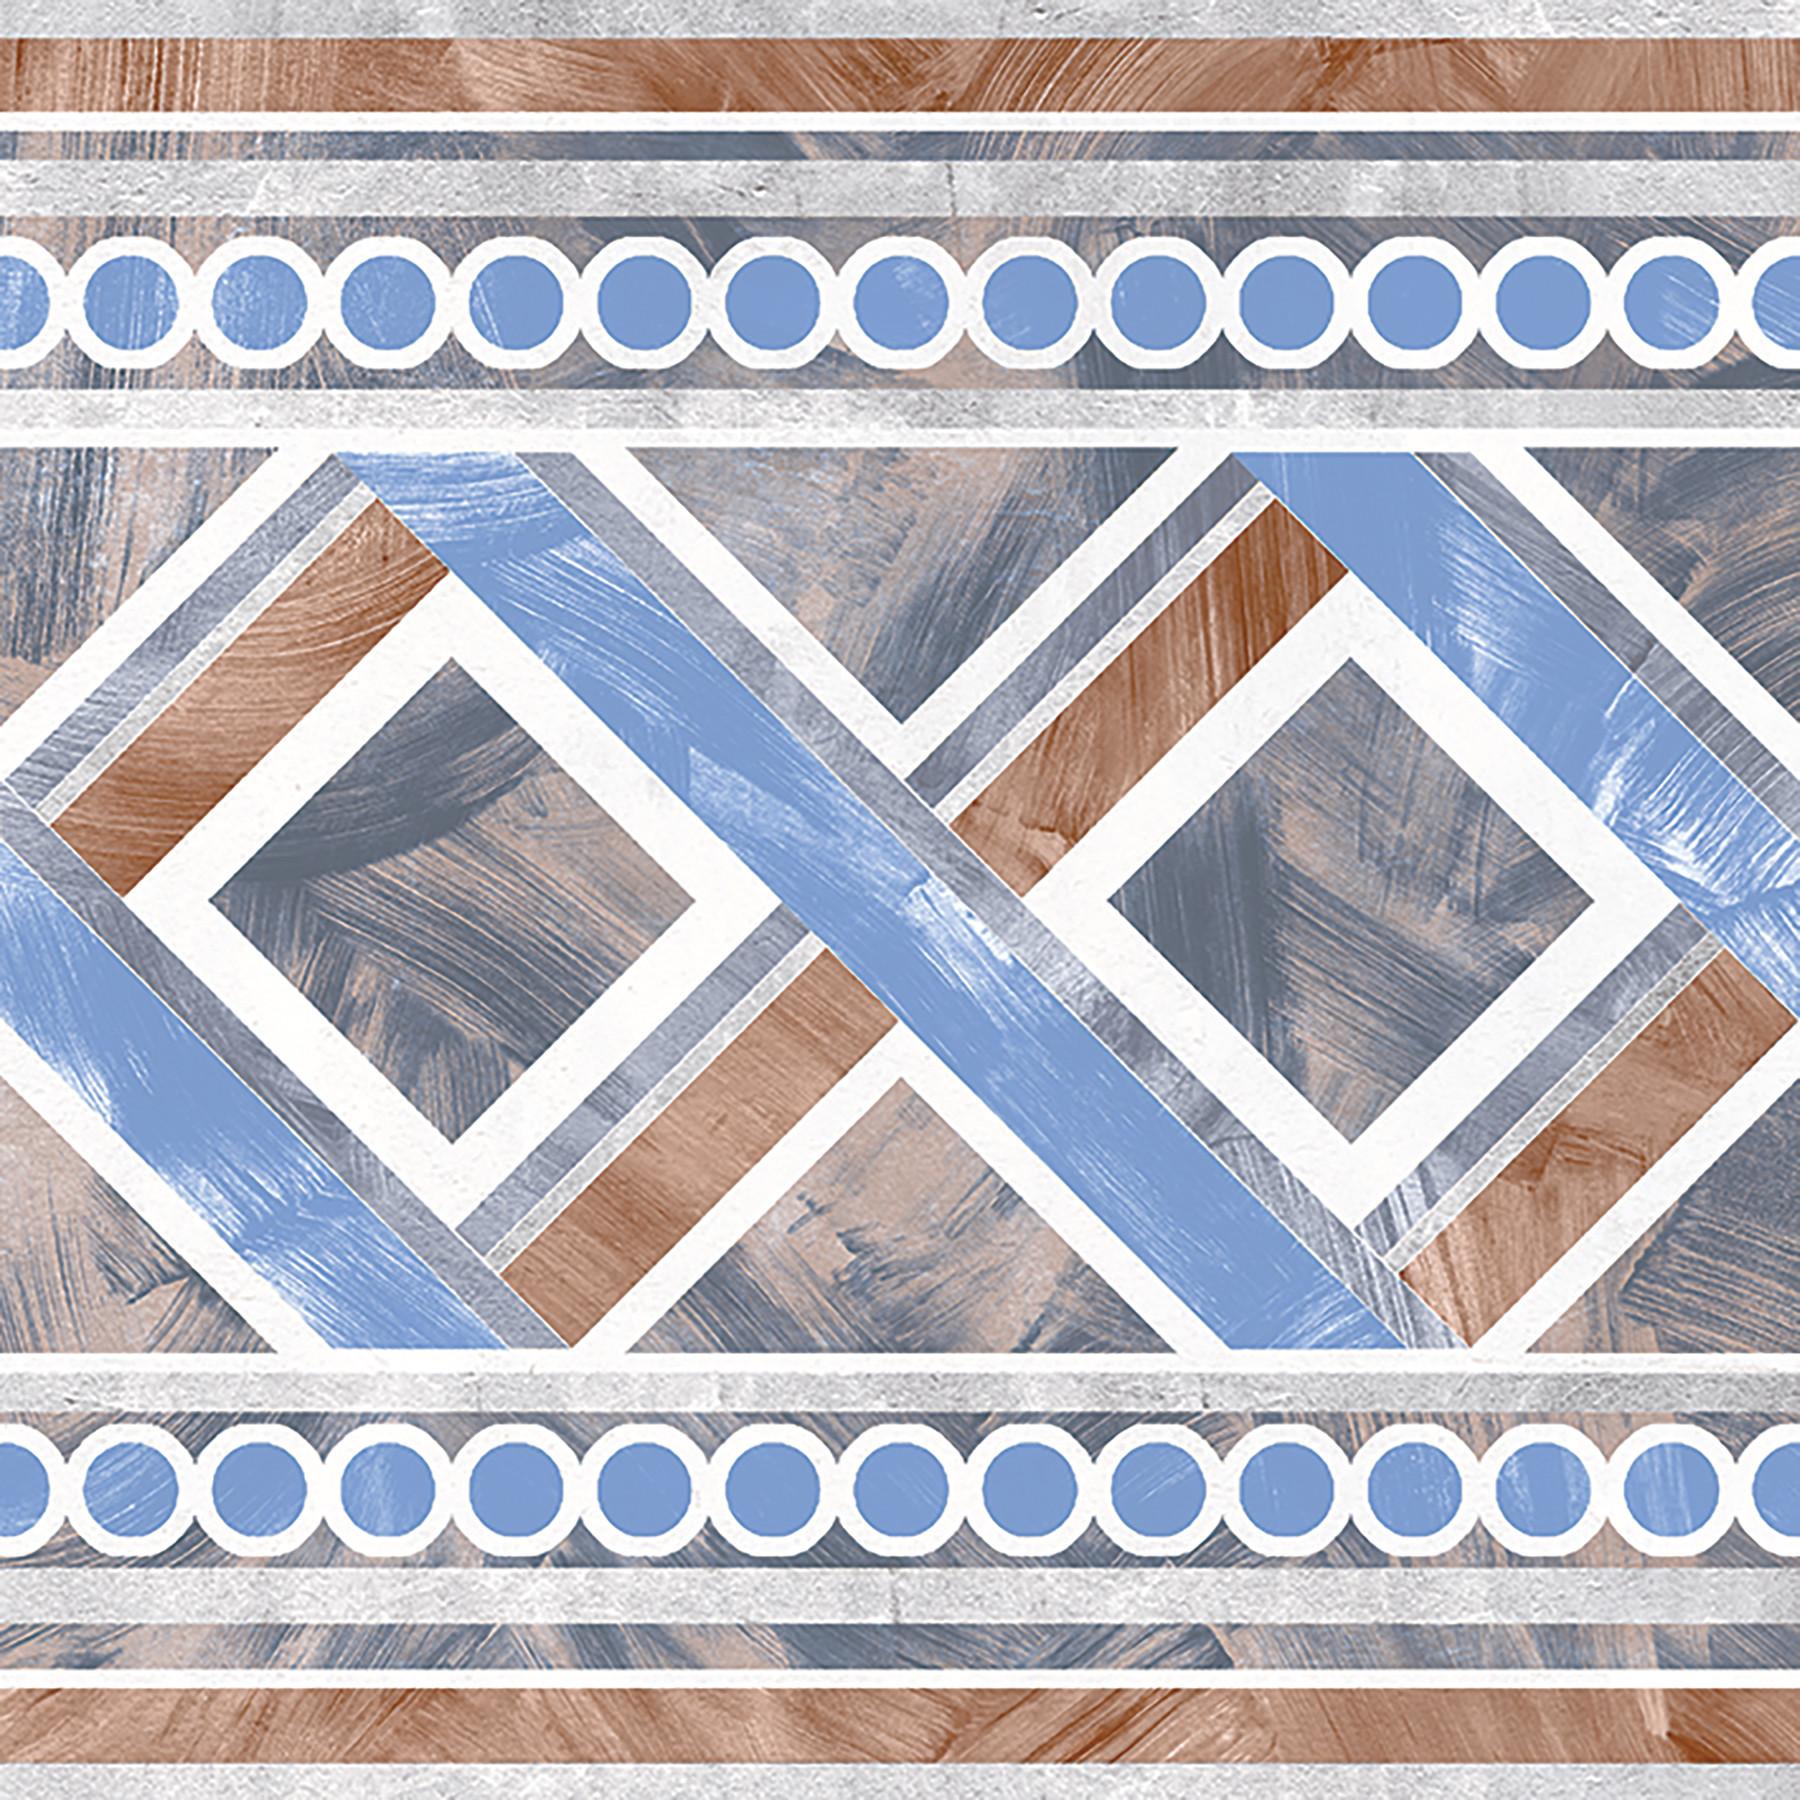 TREVISO 20x20 Blue Border